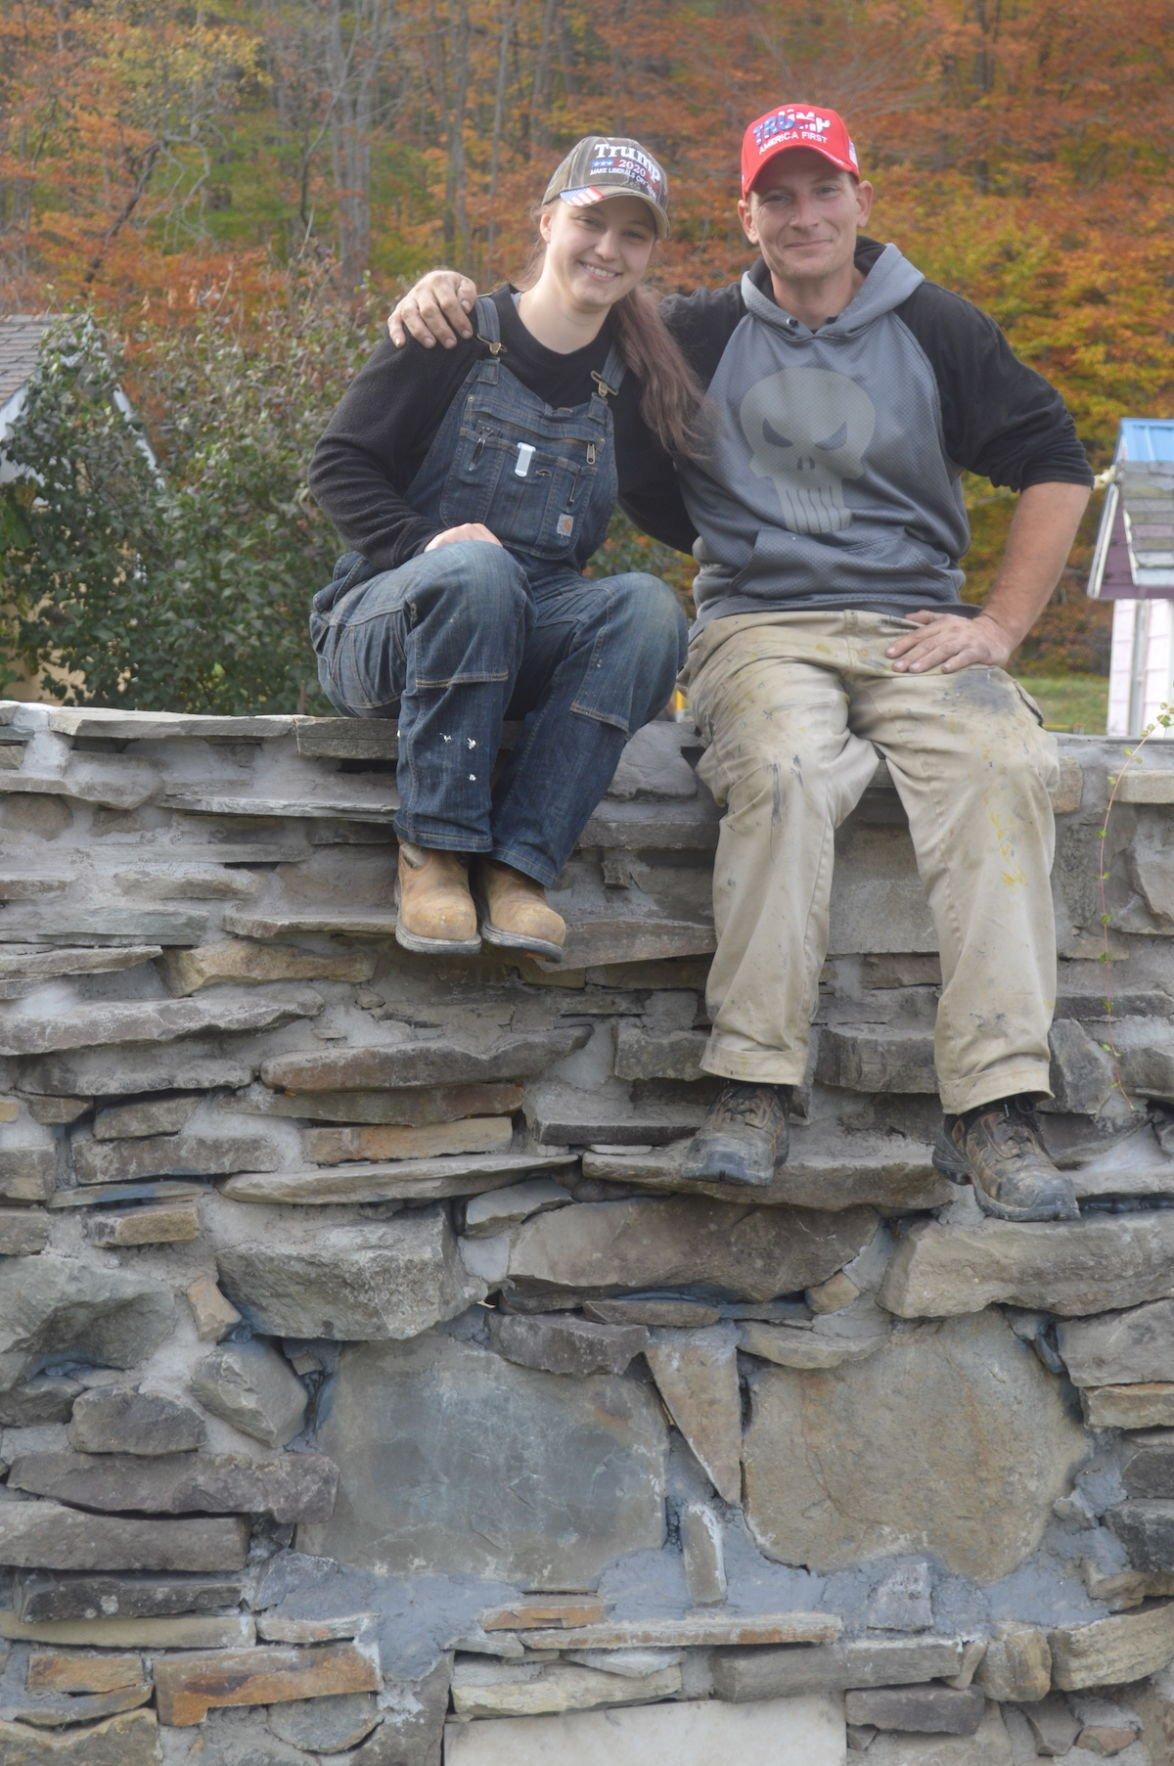 Rock wall builders